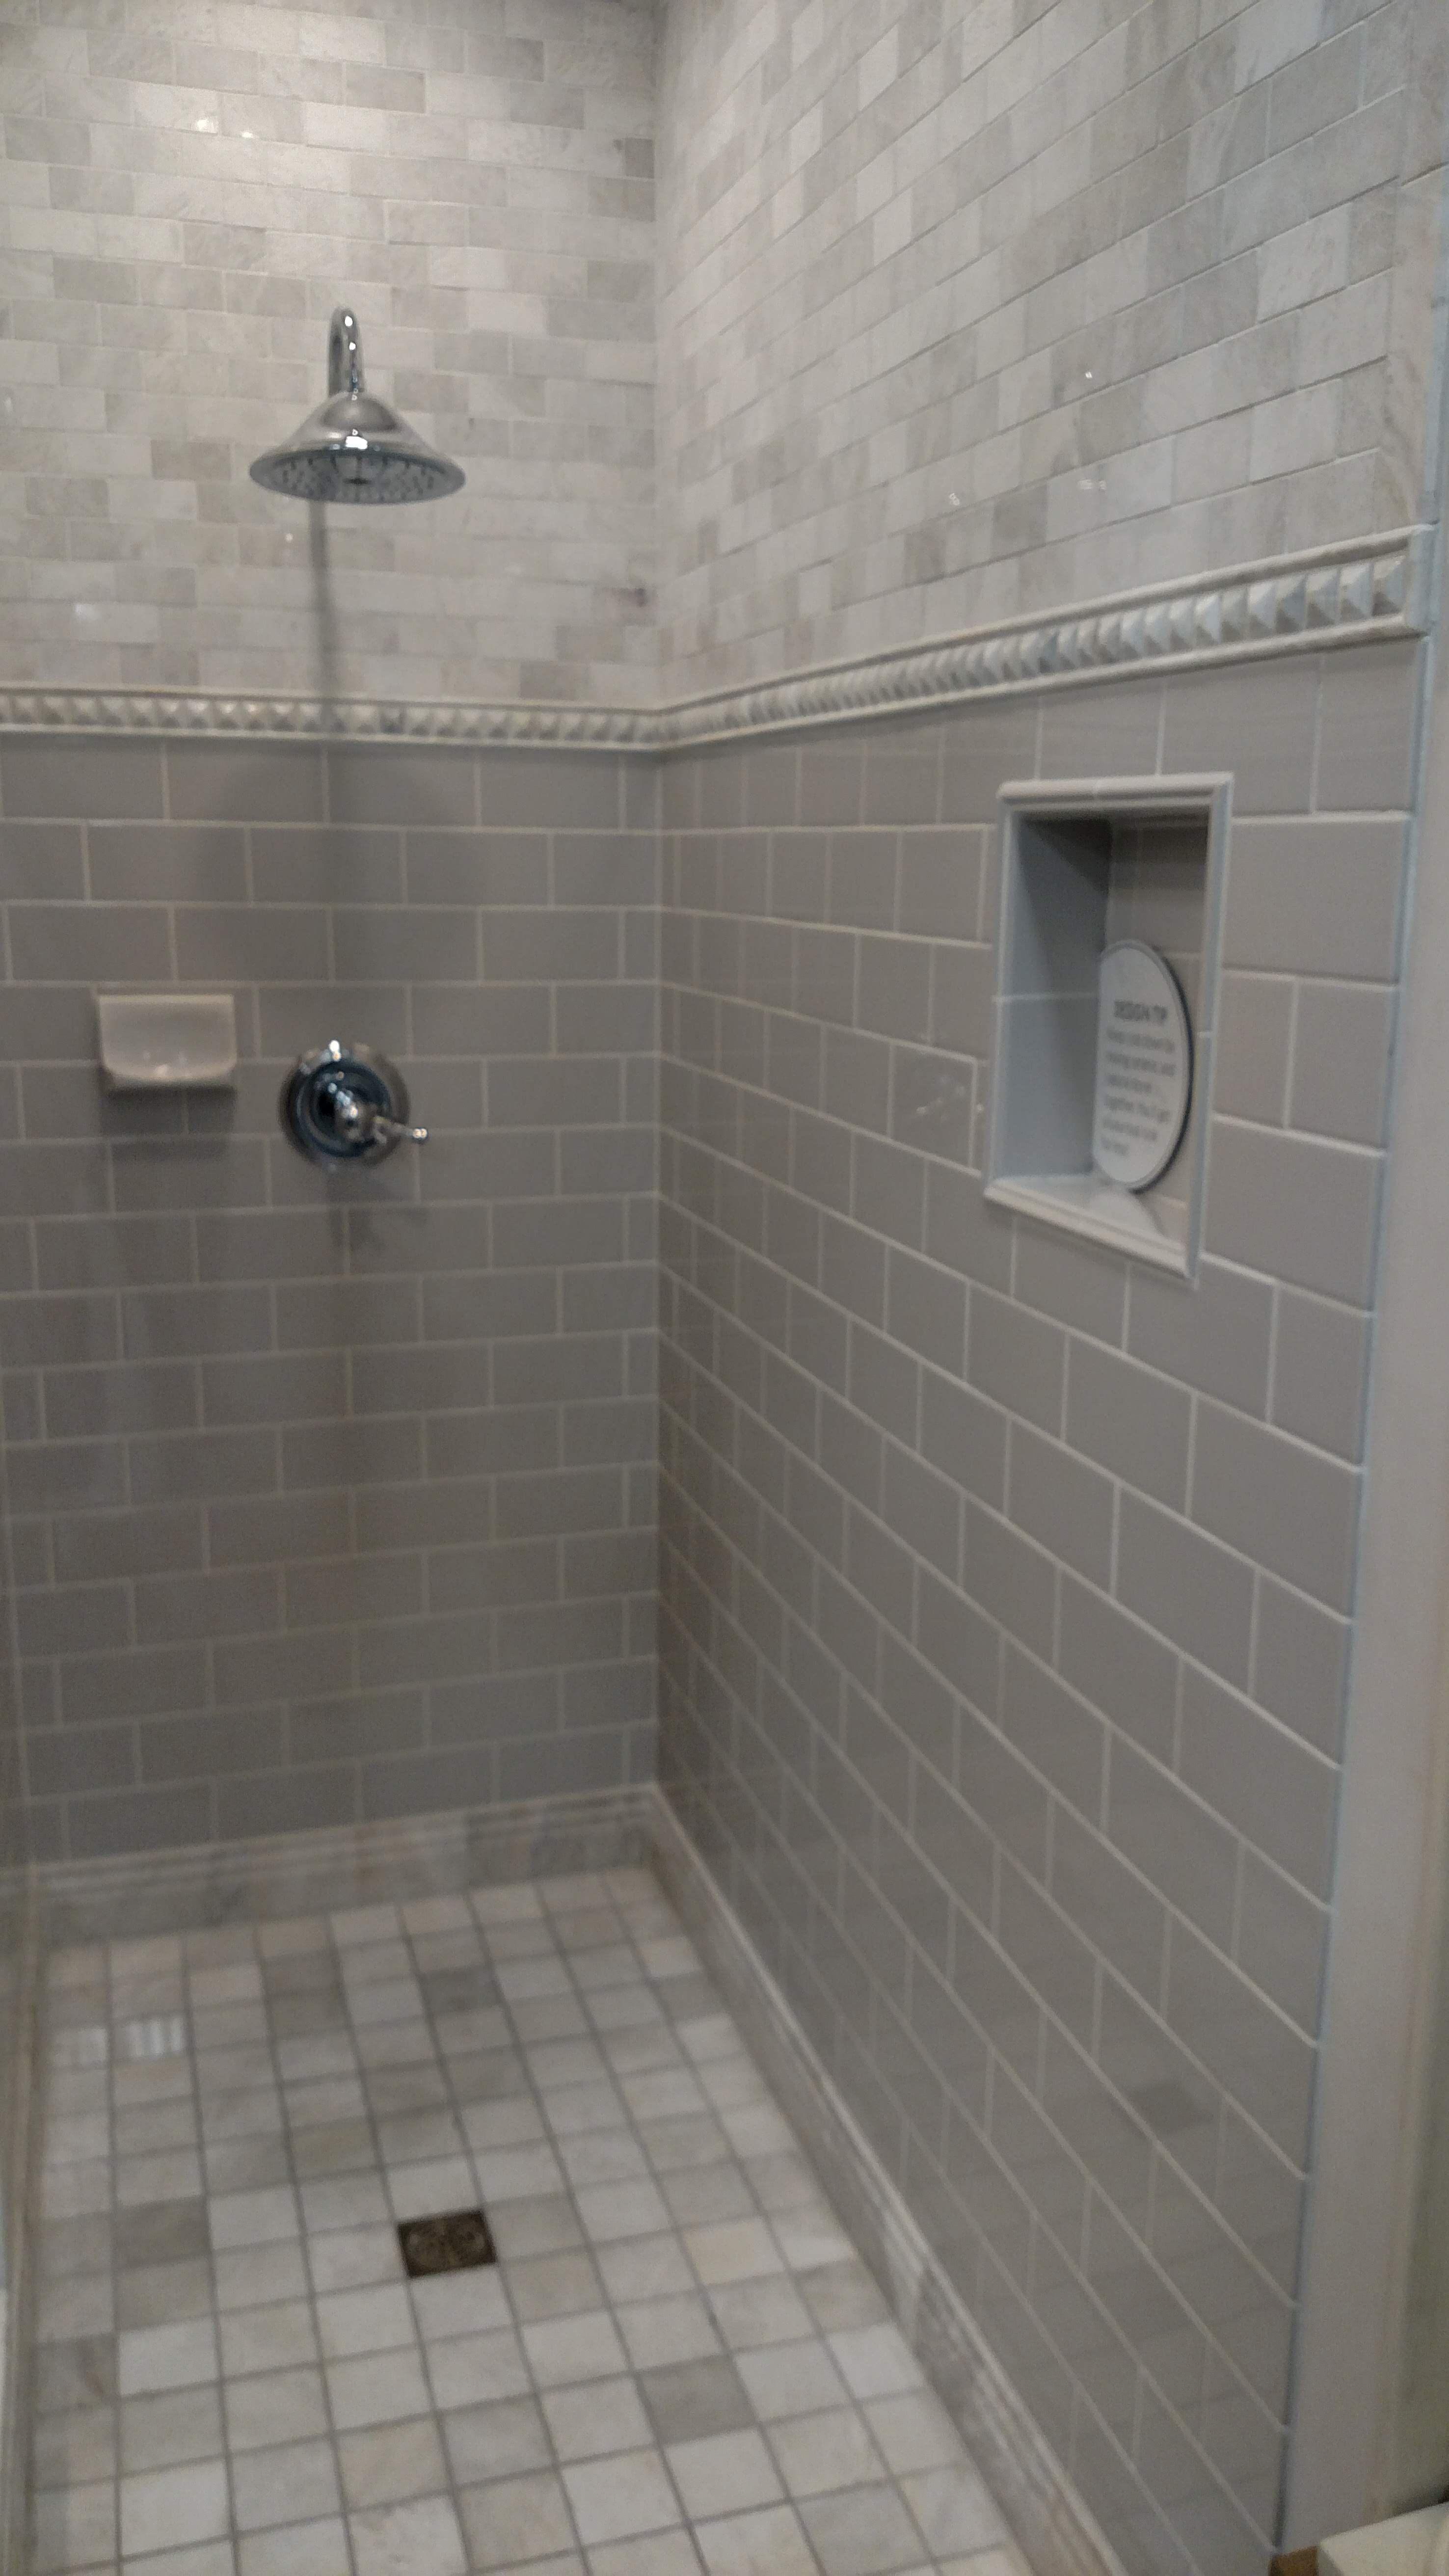 Marble And Ceramic Tiles Mix In Shower Shower Tile Master Bathroom Ceramic Tiles